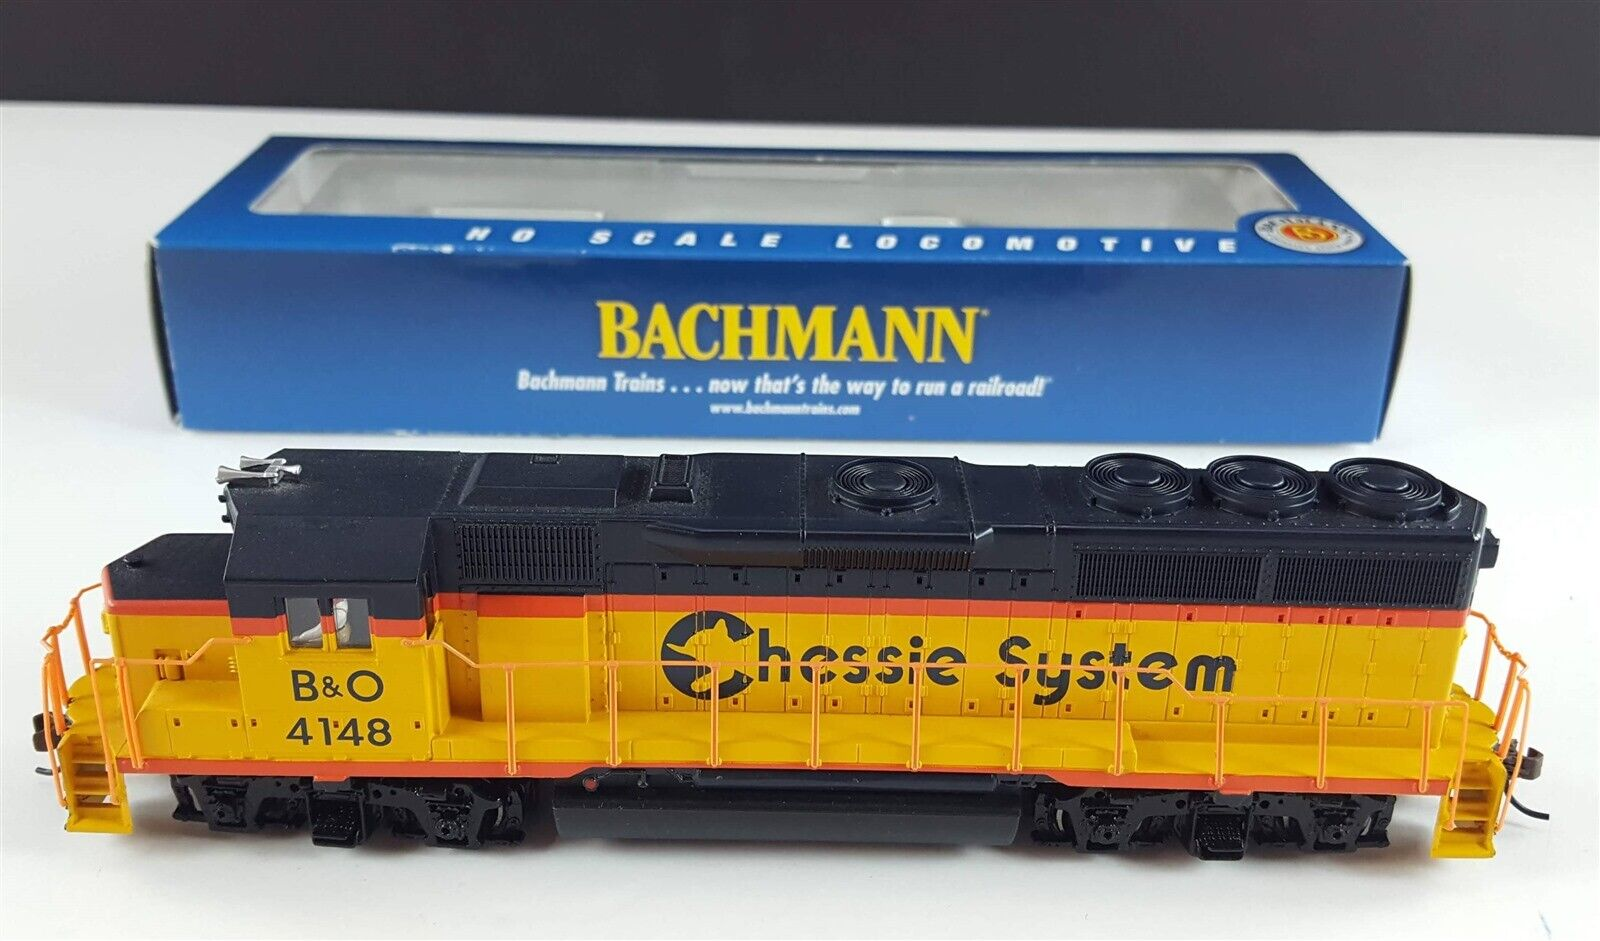 Bachuomon 63507 B&O Chessie EMD GP40 Diesel Locomotive 4148 HO Scale